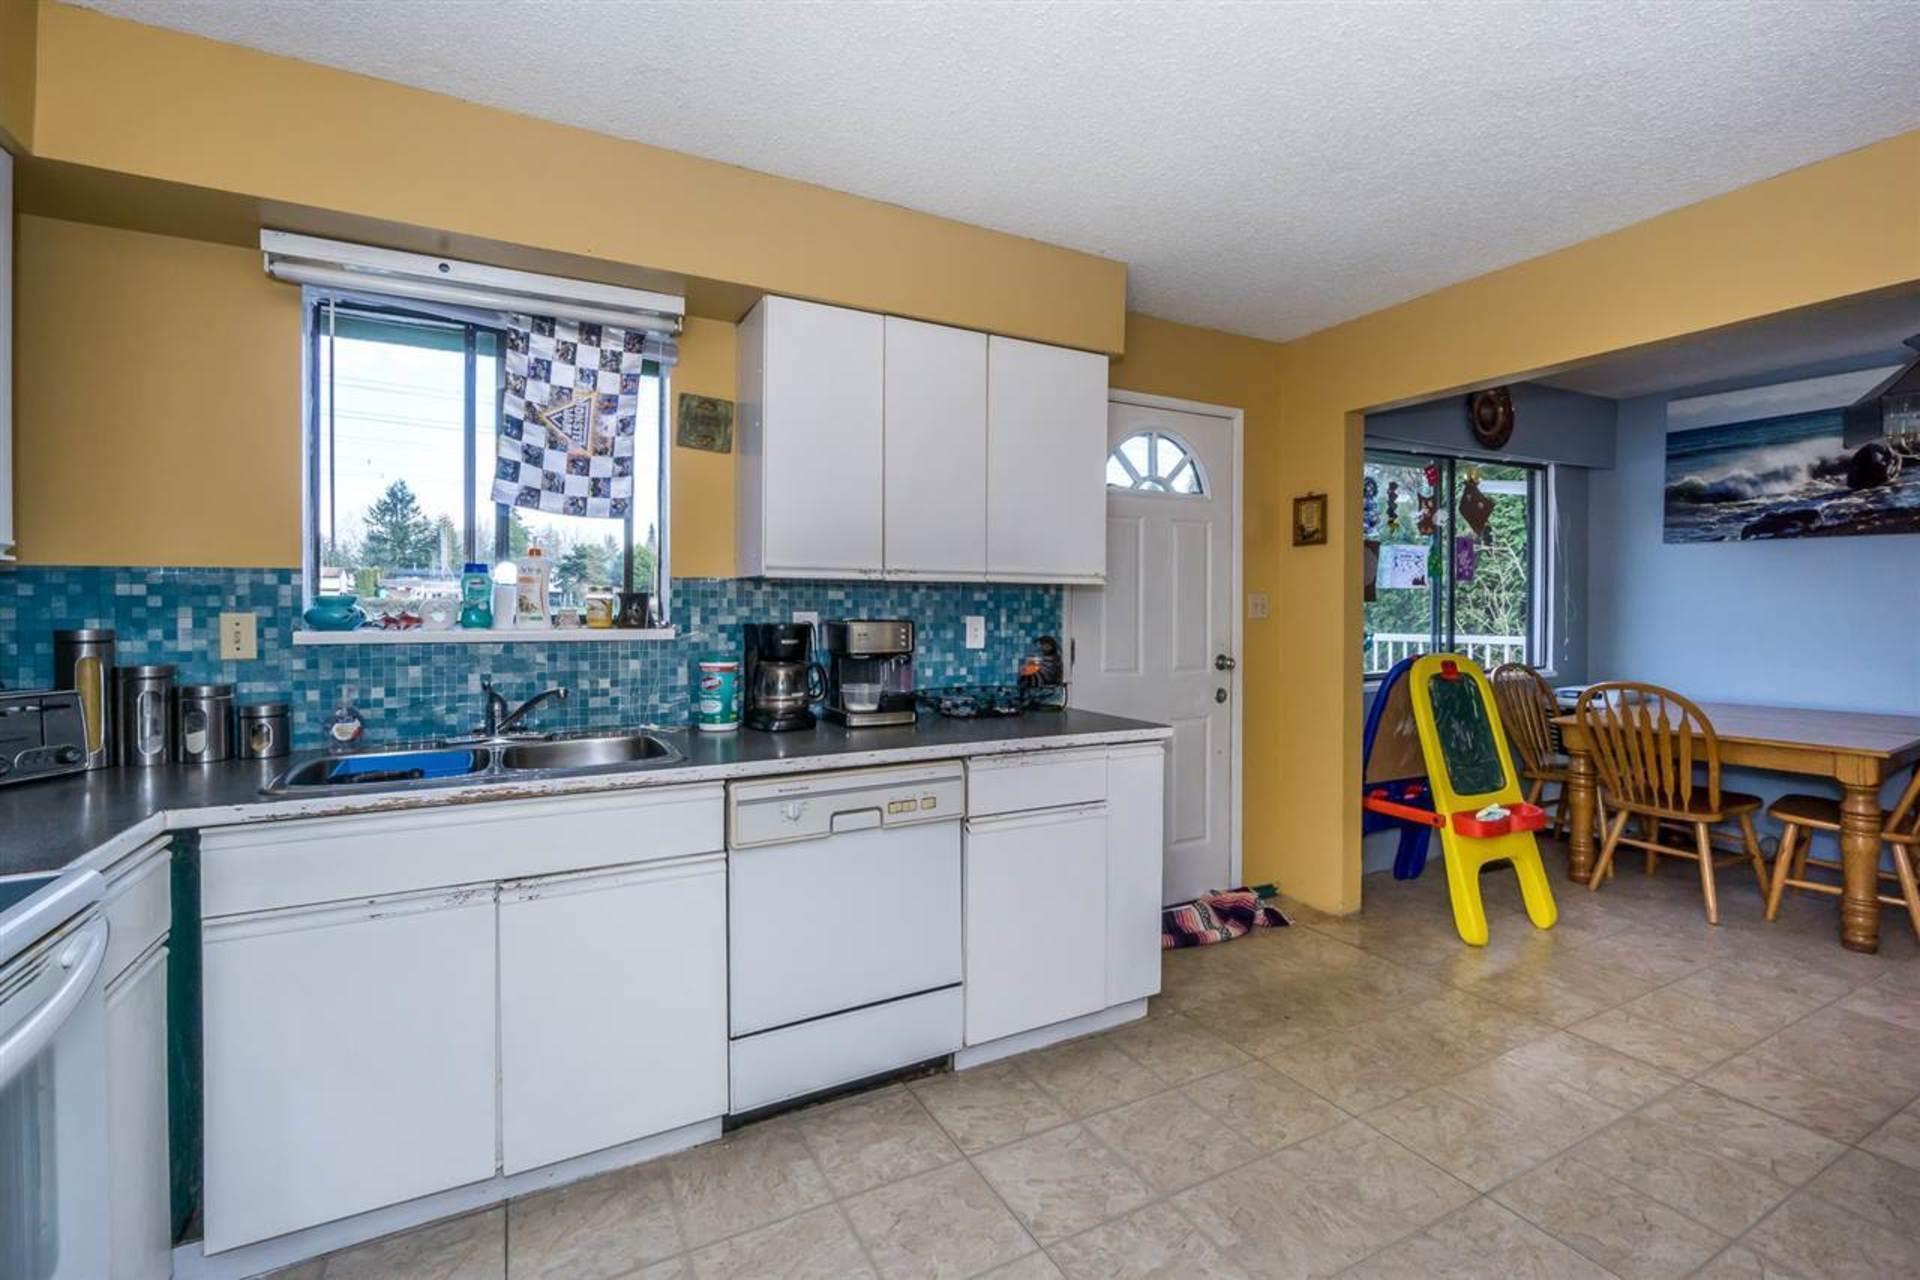 6192-morgan-drive-cloverdale-bc-cloverdale-10 at 6192 Morgan Drive, Cloverdale BC, Cloverdale